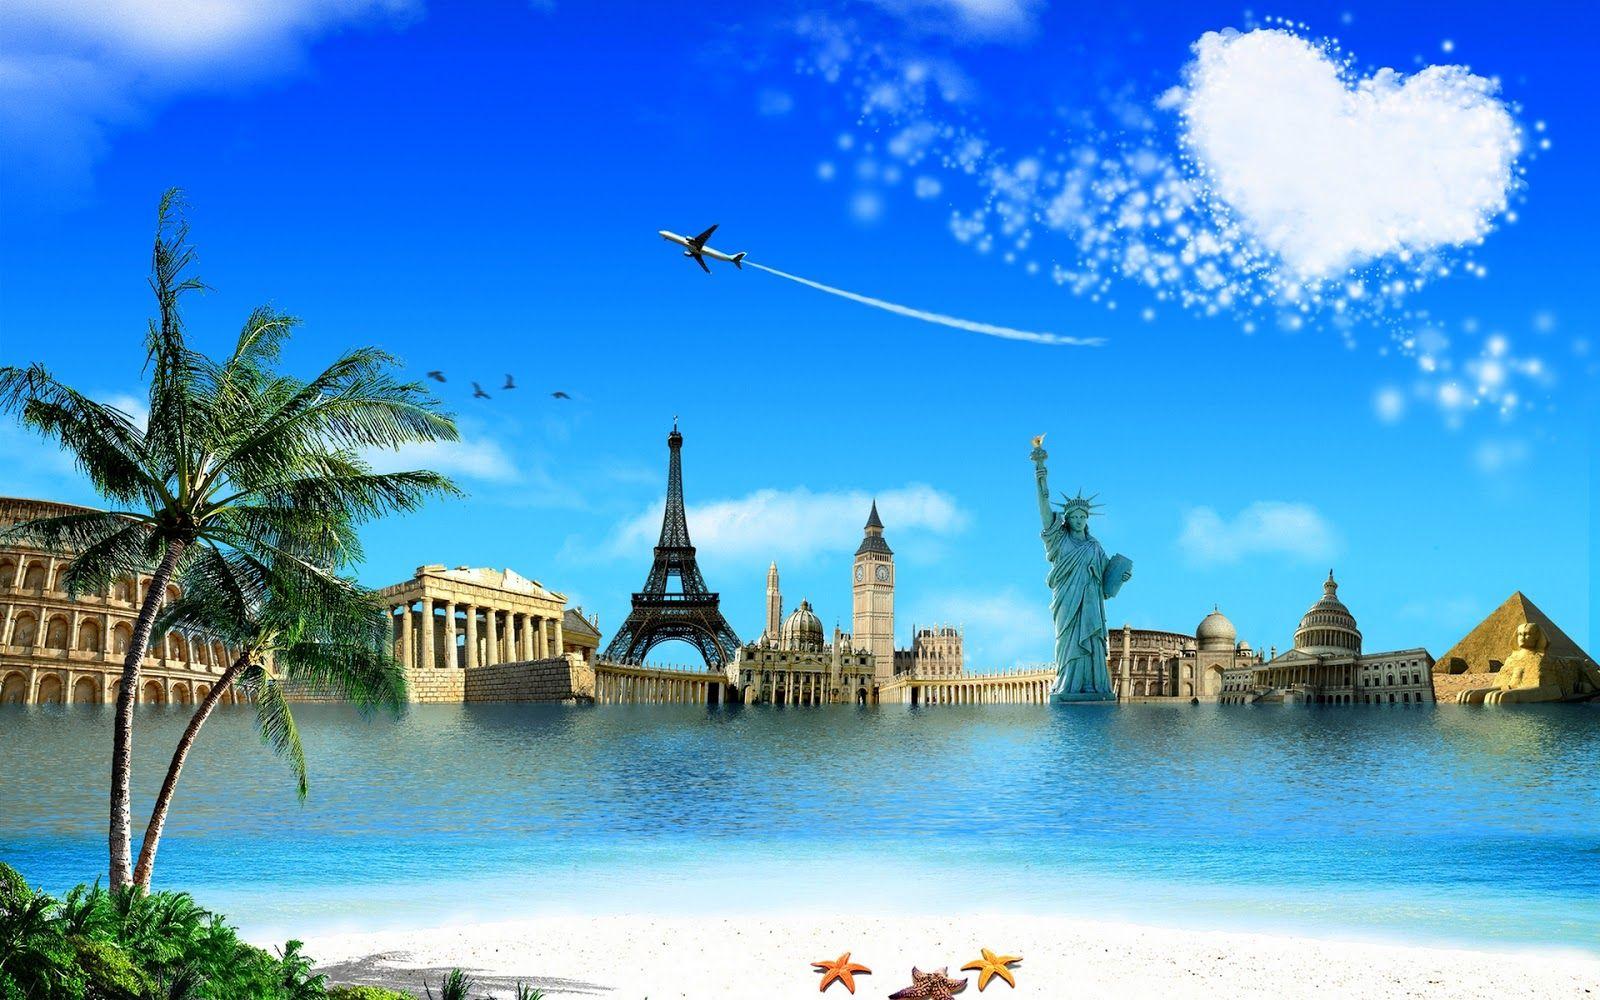 wonders of the world d wallpaper free 1600 1000 wonders of the